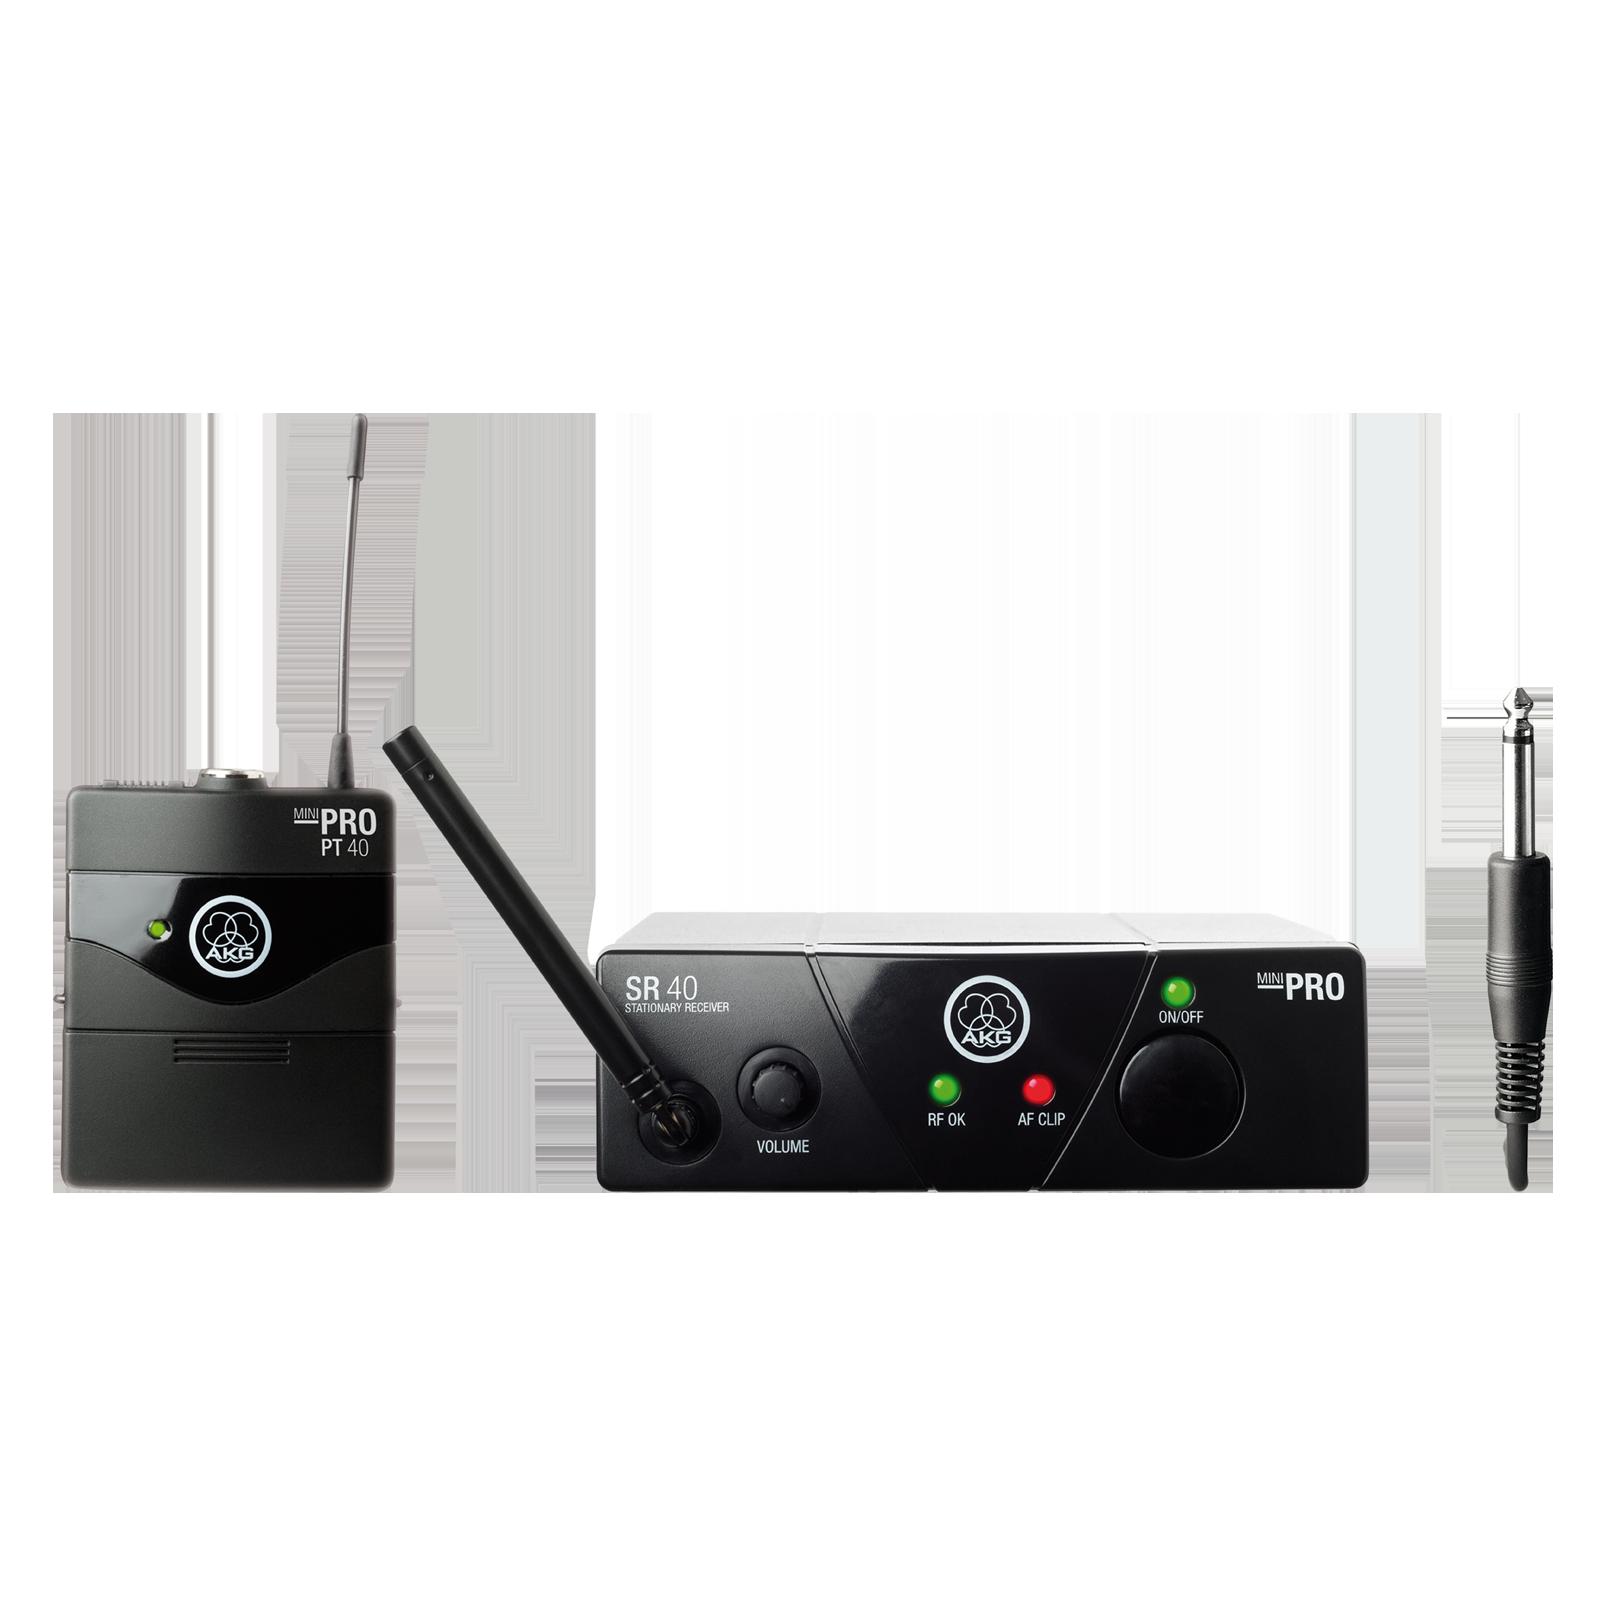 WMS40 Mini Instrumental Set Band-US25-C (B-Stock) - Black - Wireless microphone system - Hero